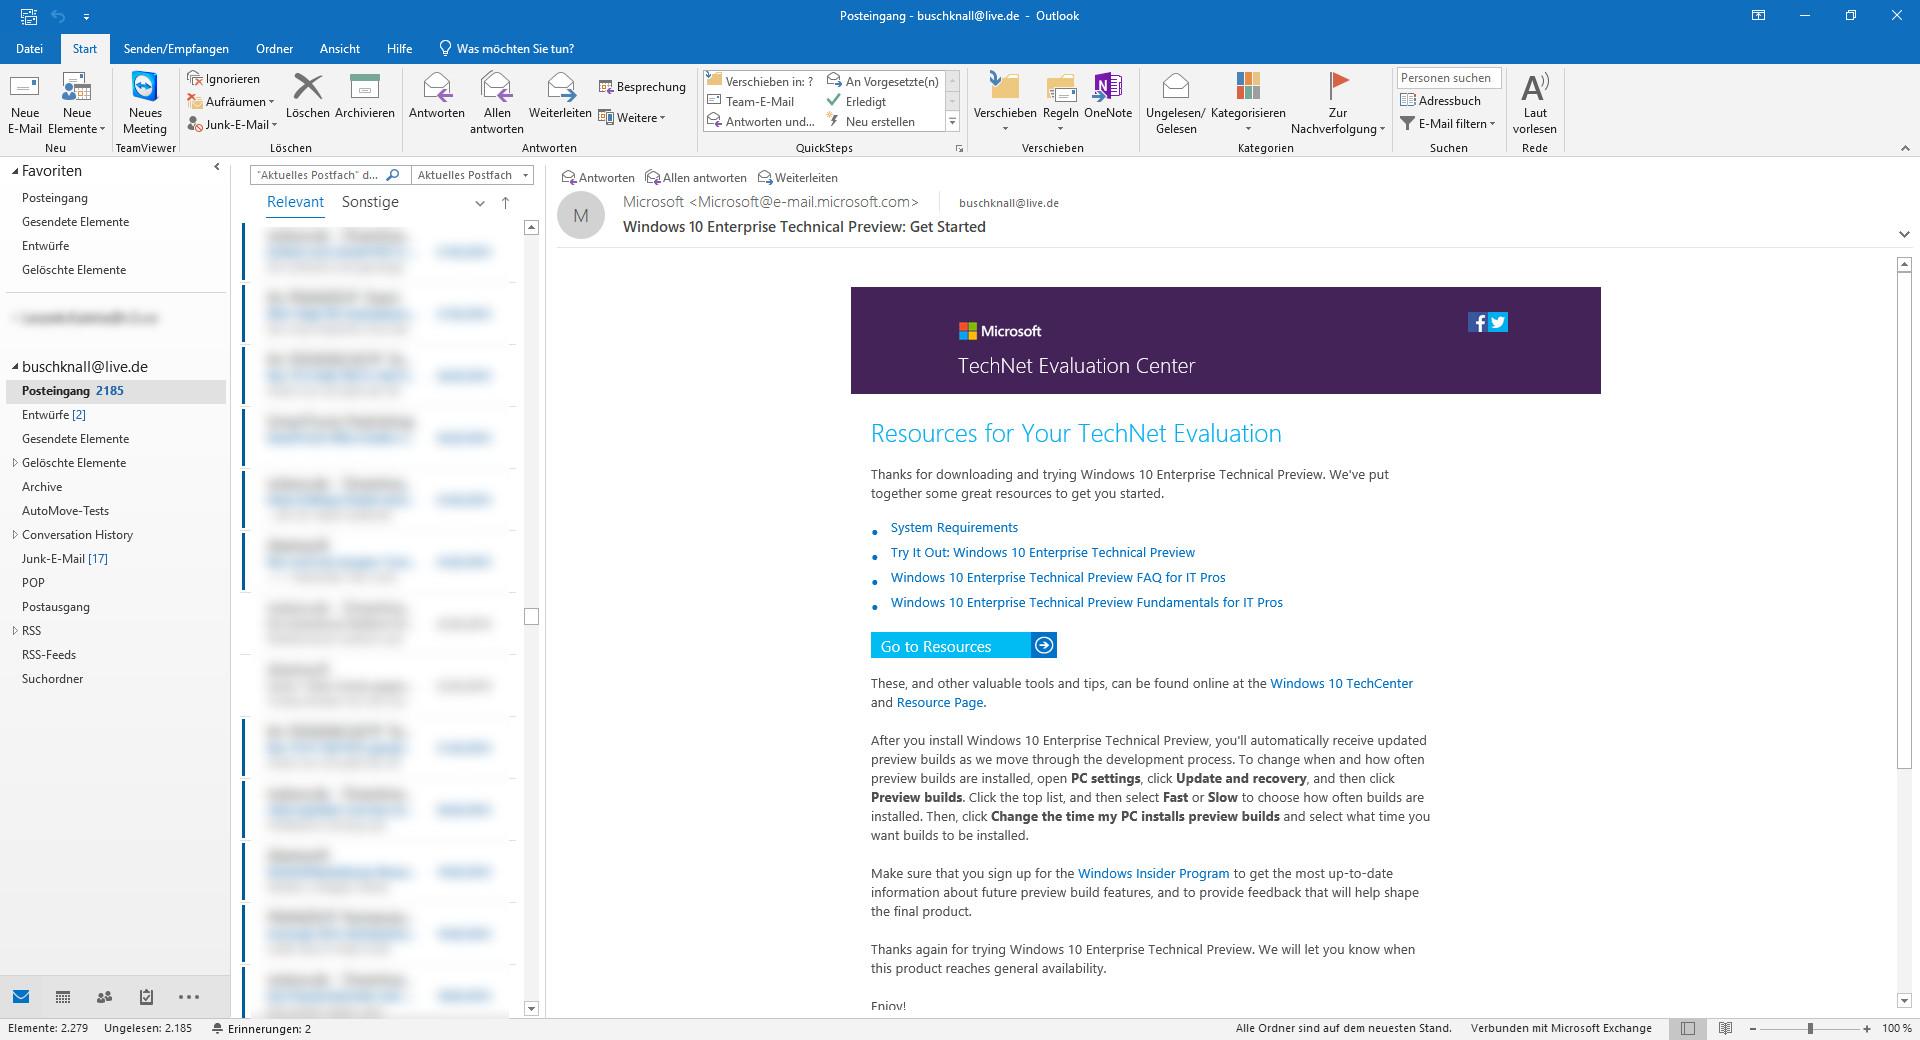 Screenshot 1 - Microsoft Outlook 2021